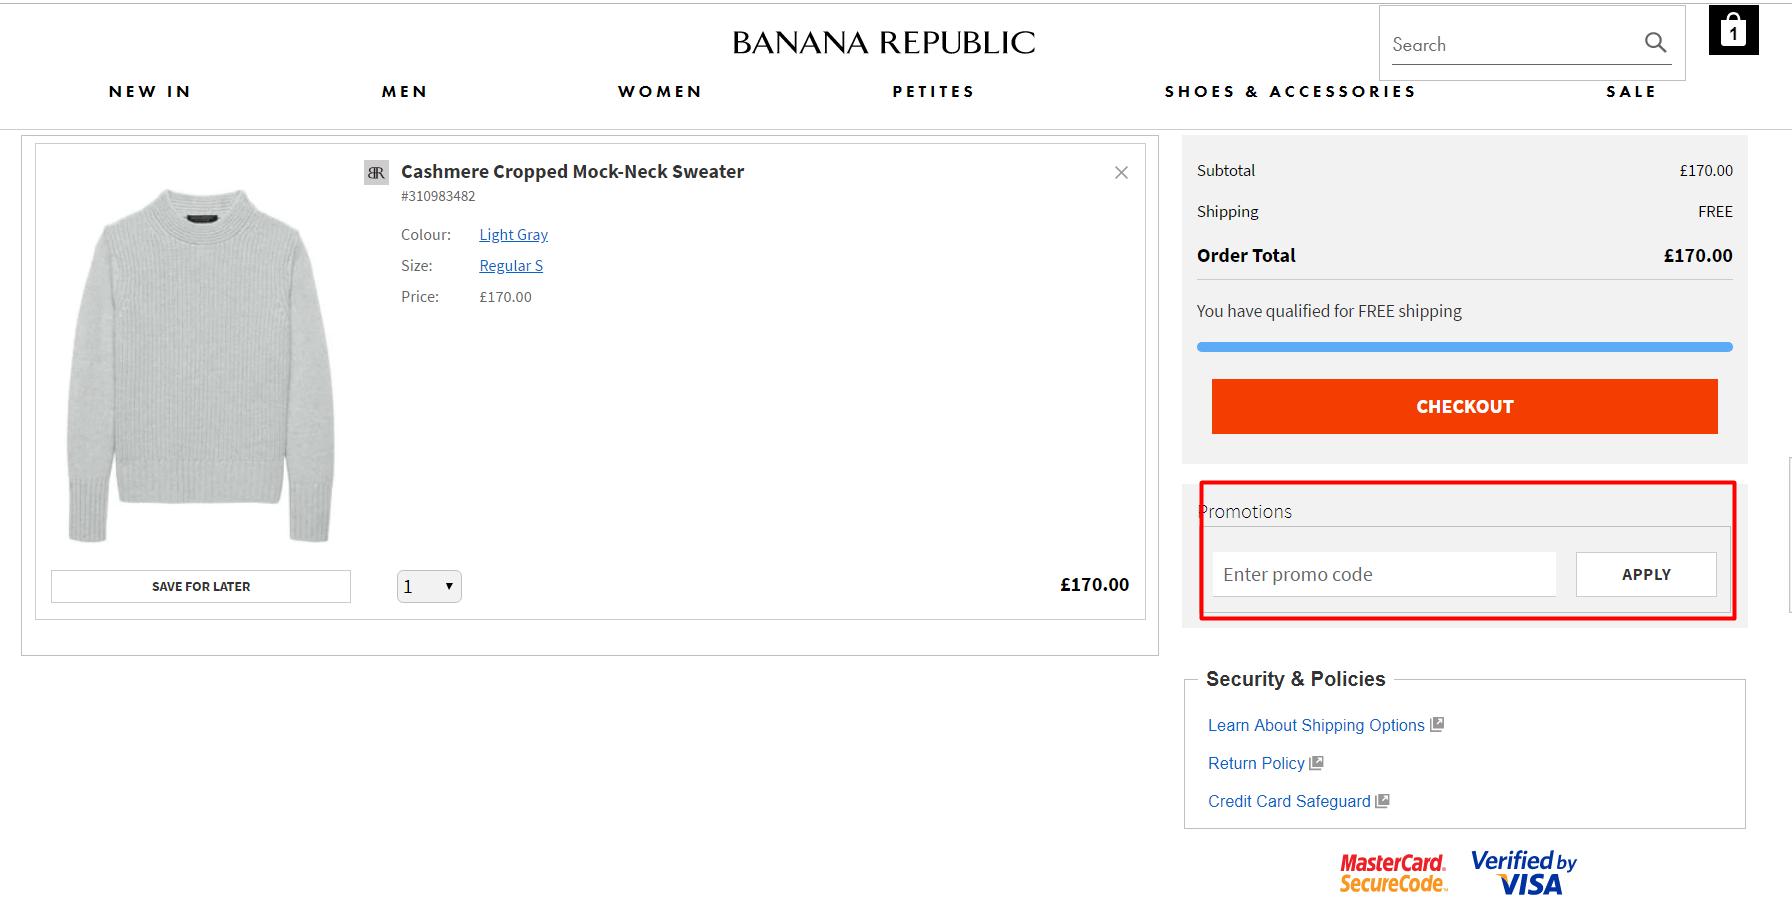 How do I use my Banana Republic discount code?